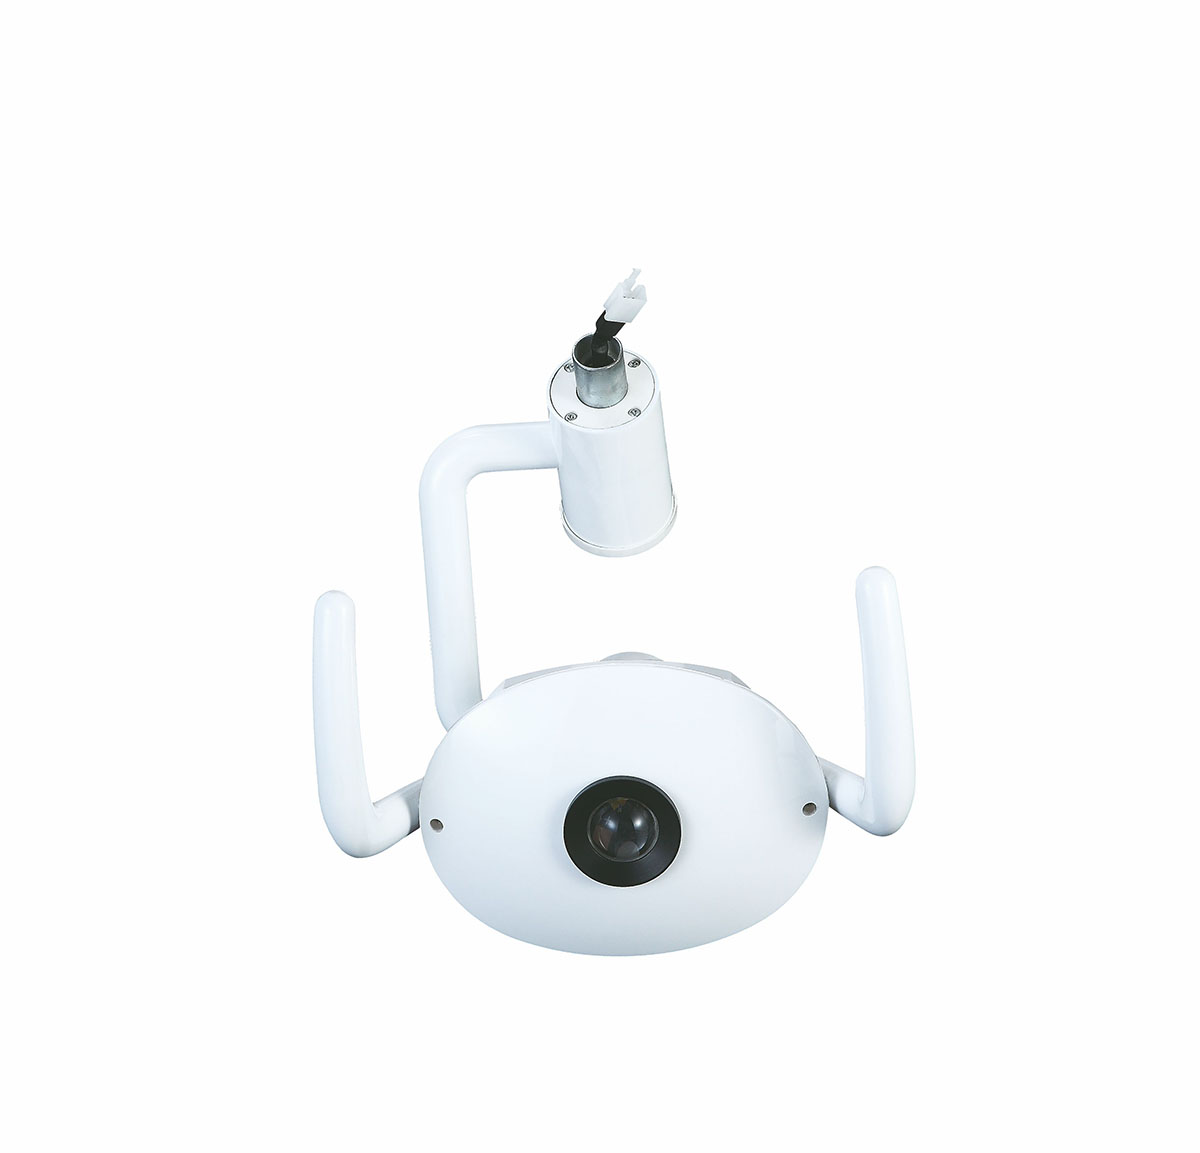 B#LED耳鼻喉灯SH-10115-2